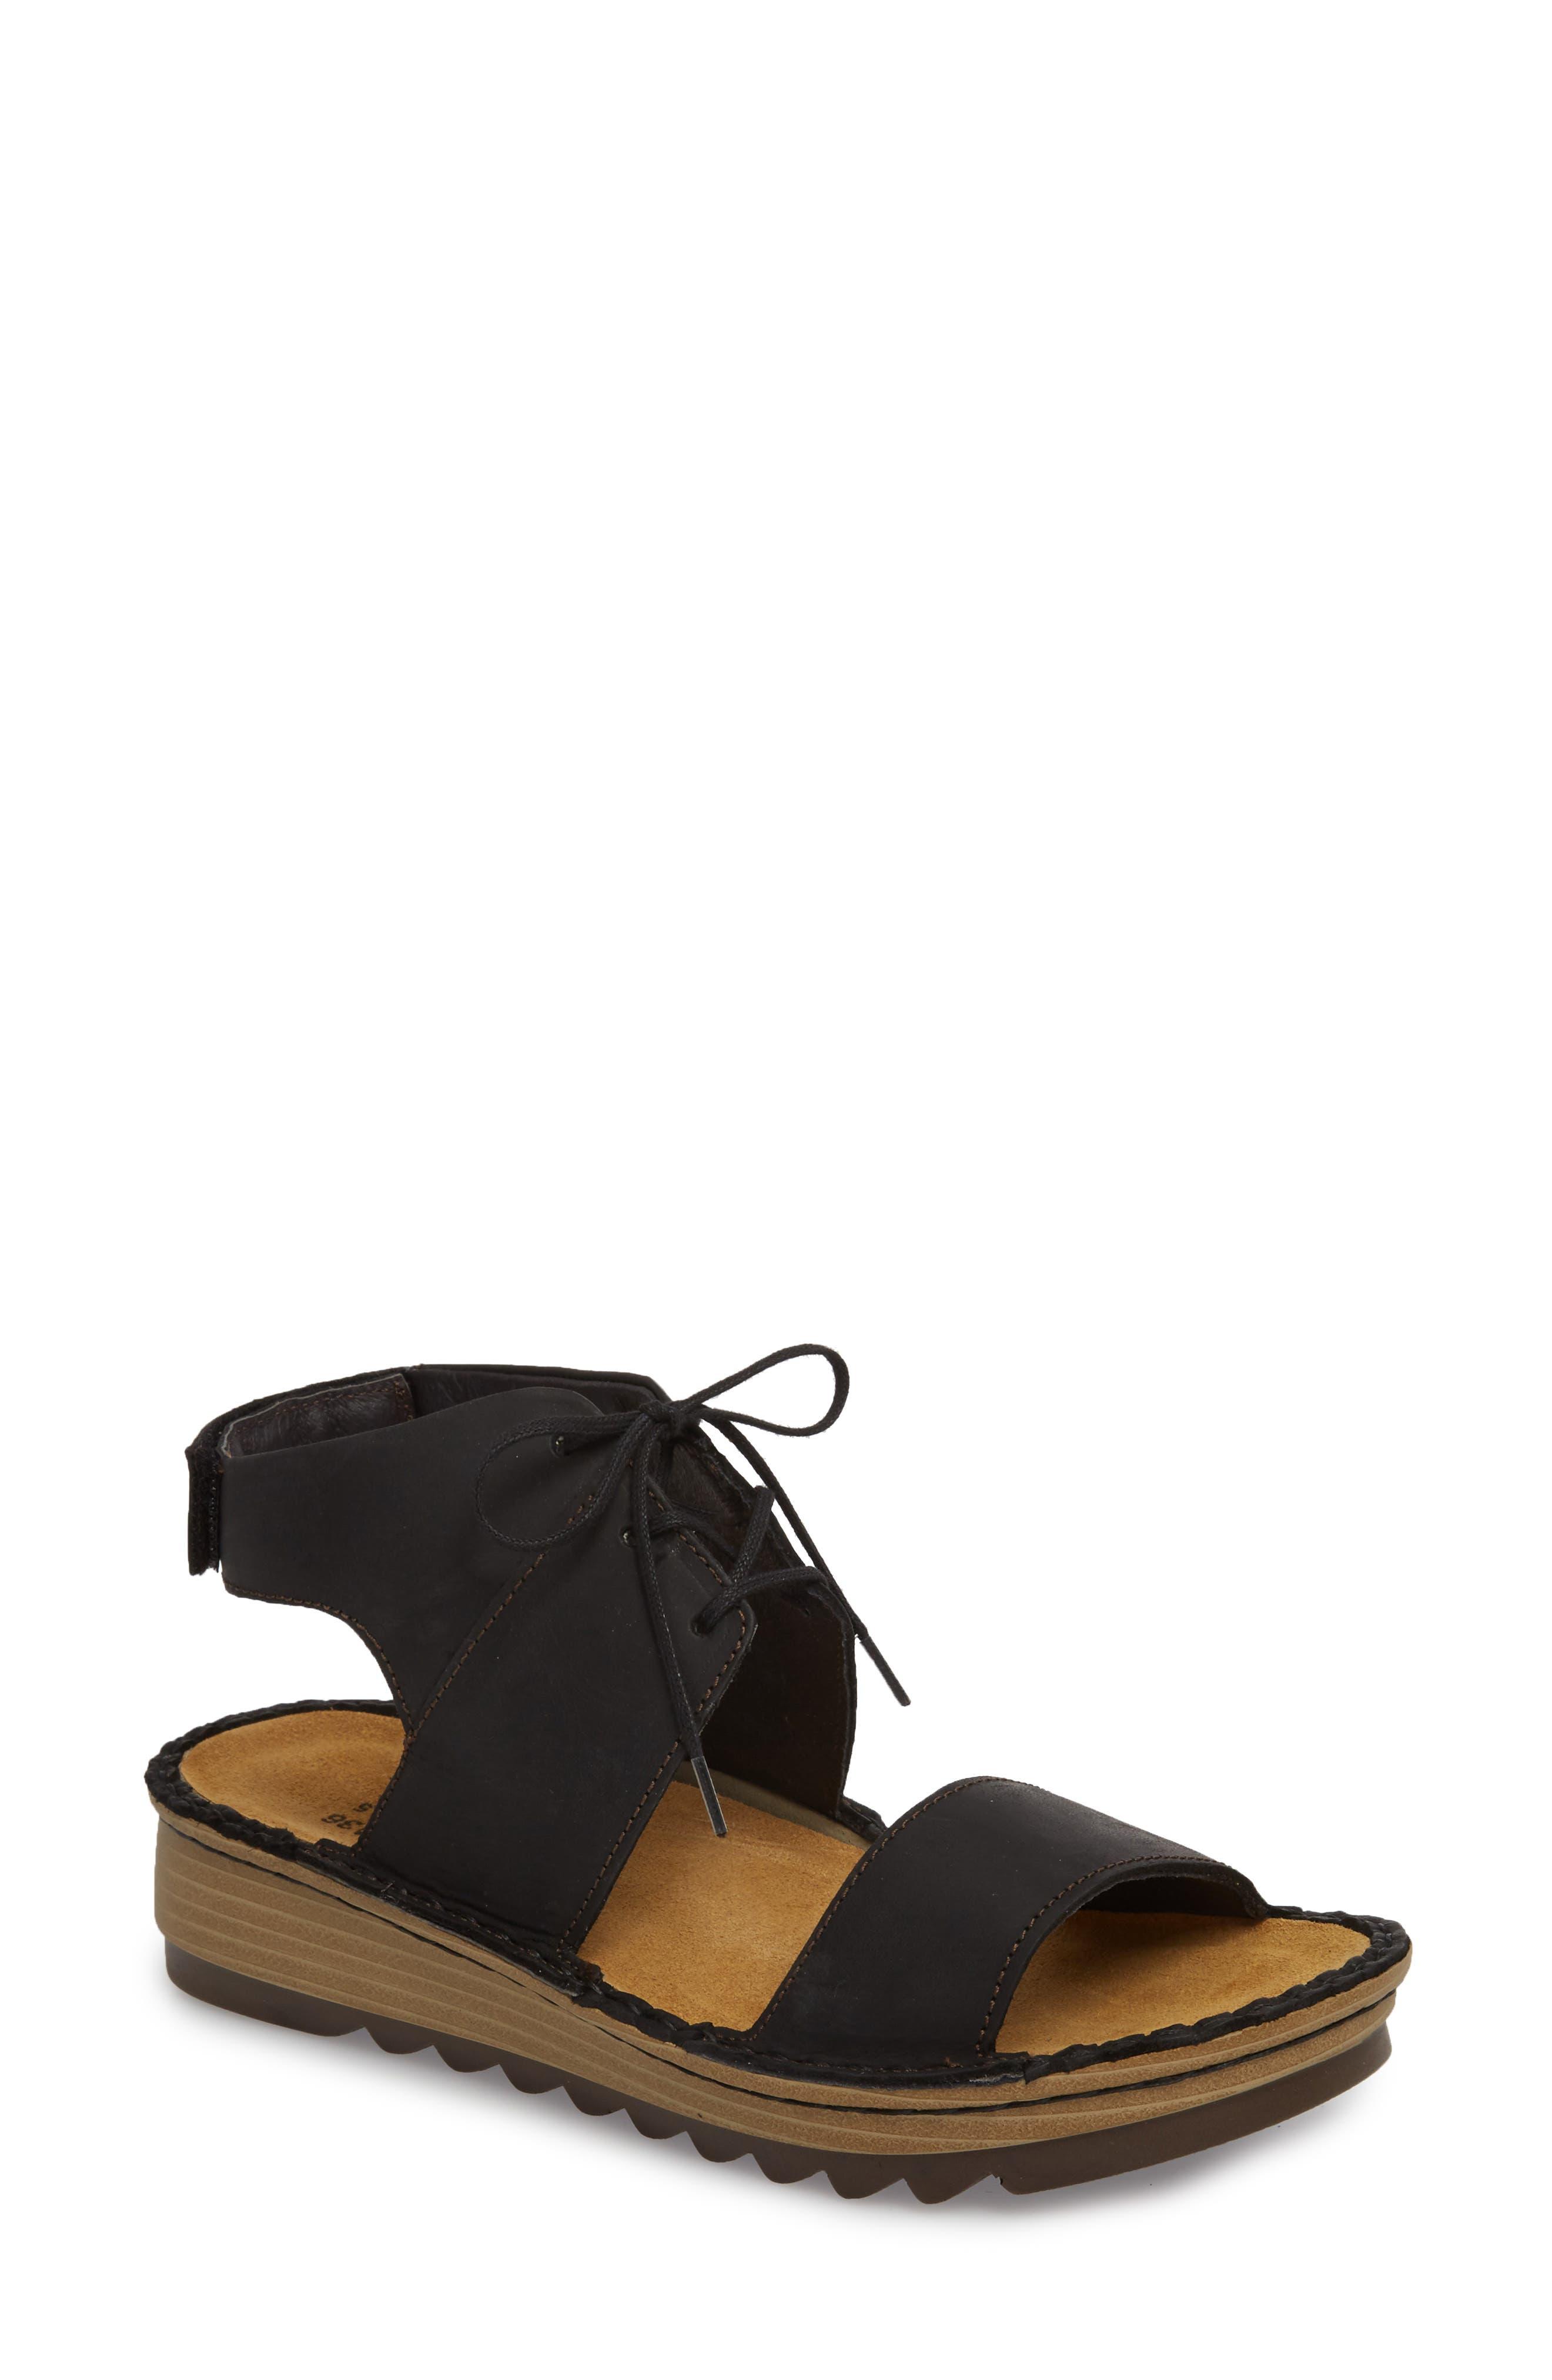 Apicola Sandal,                         Main,                         color, Oily Coal Nubuck